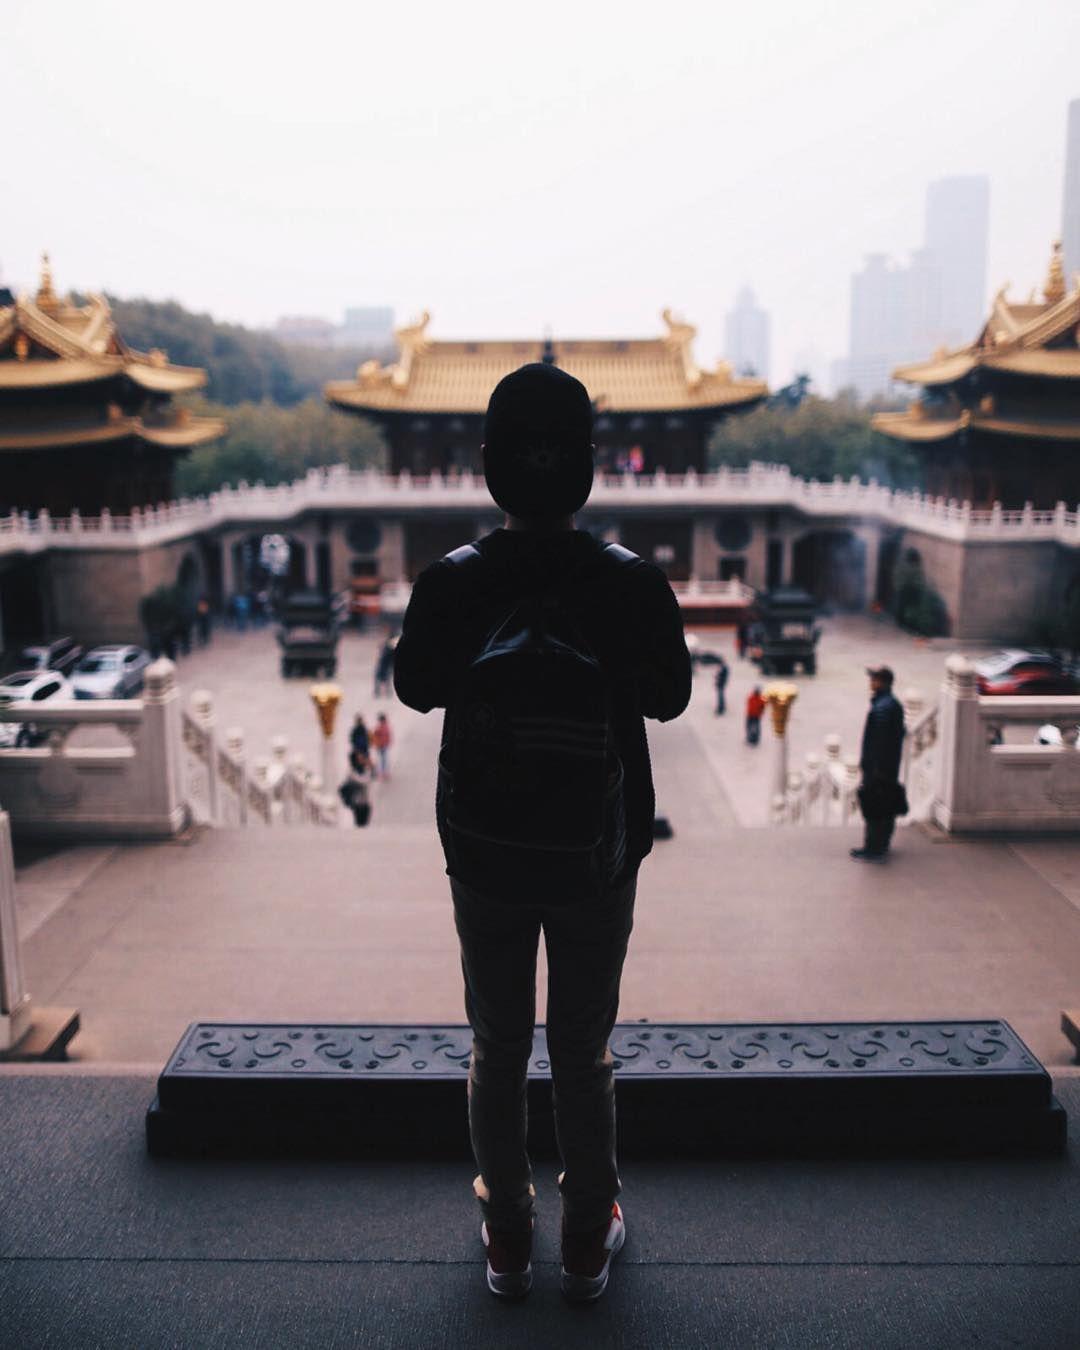 #shanghai by charliedanger